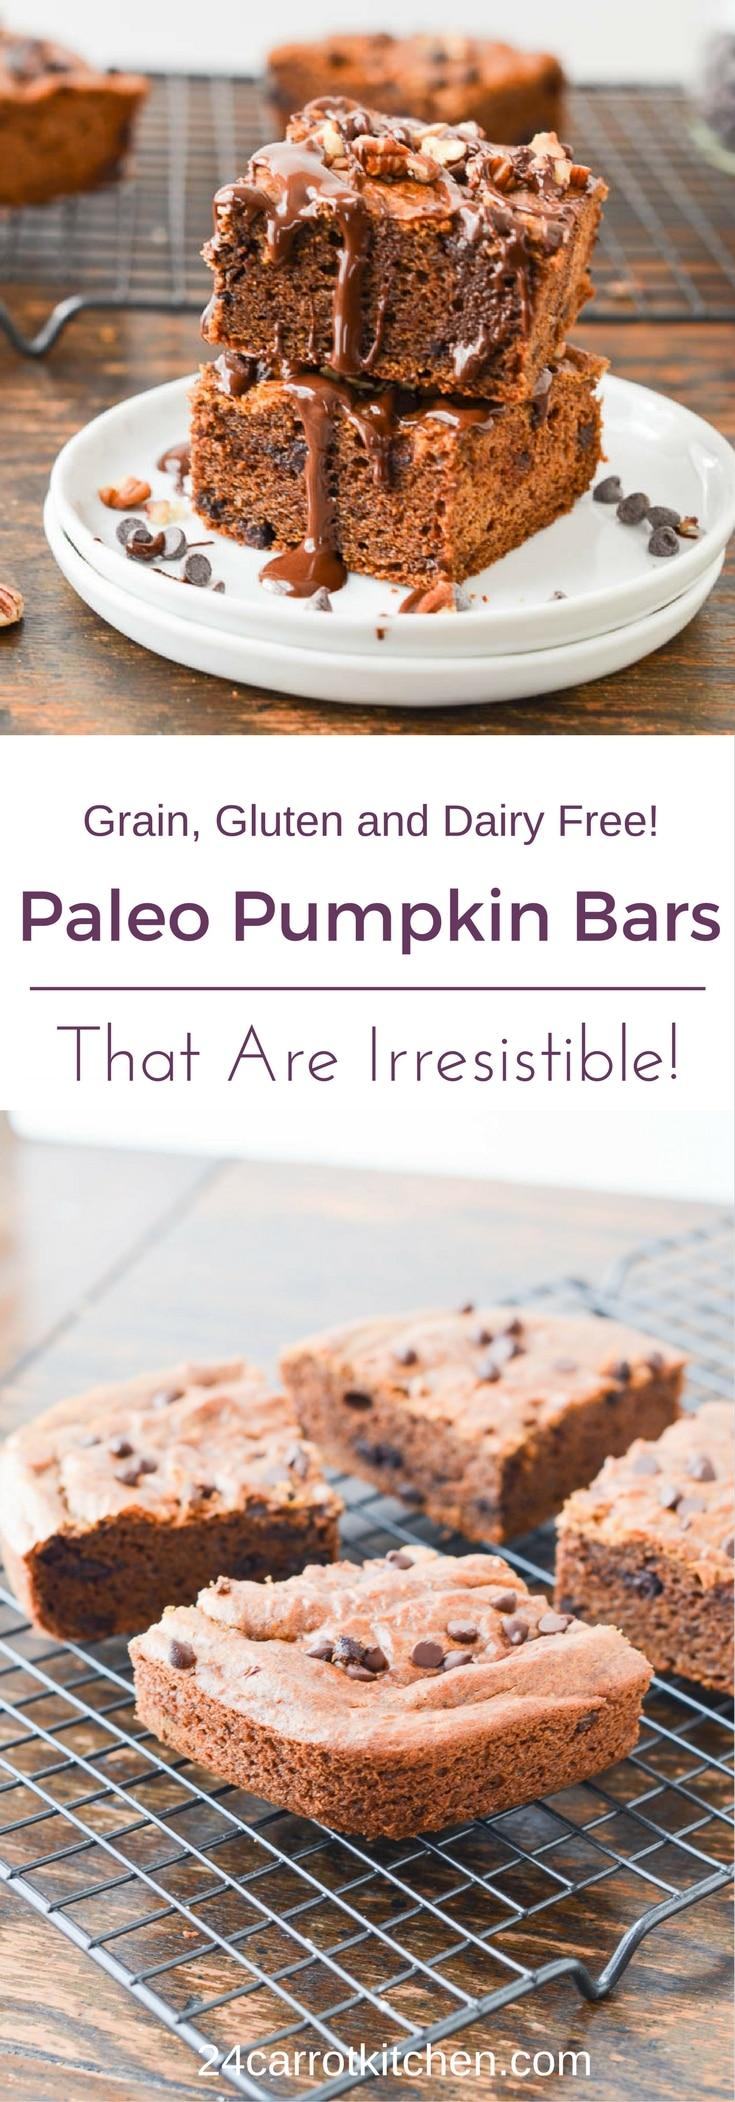 Paleo Pumpkin Bars PIN - 24 Carrot Kitchen - 24 Carrot Kitchen